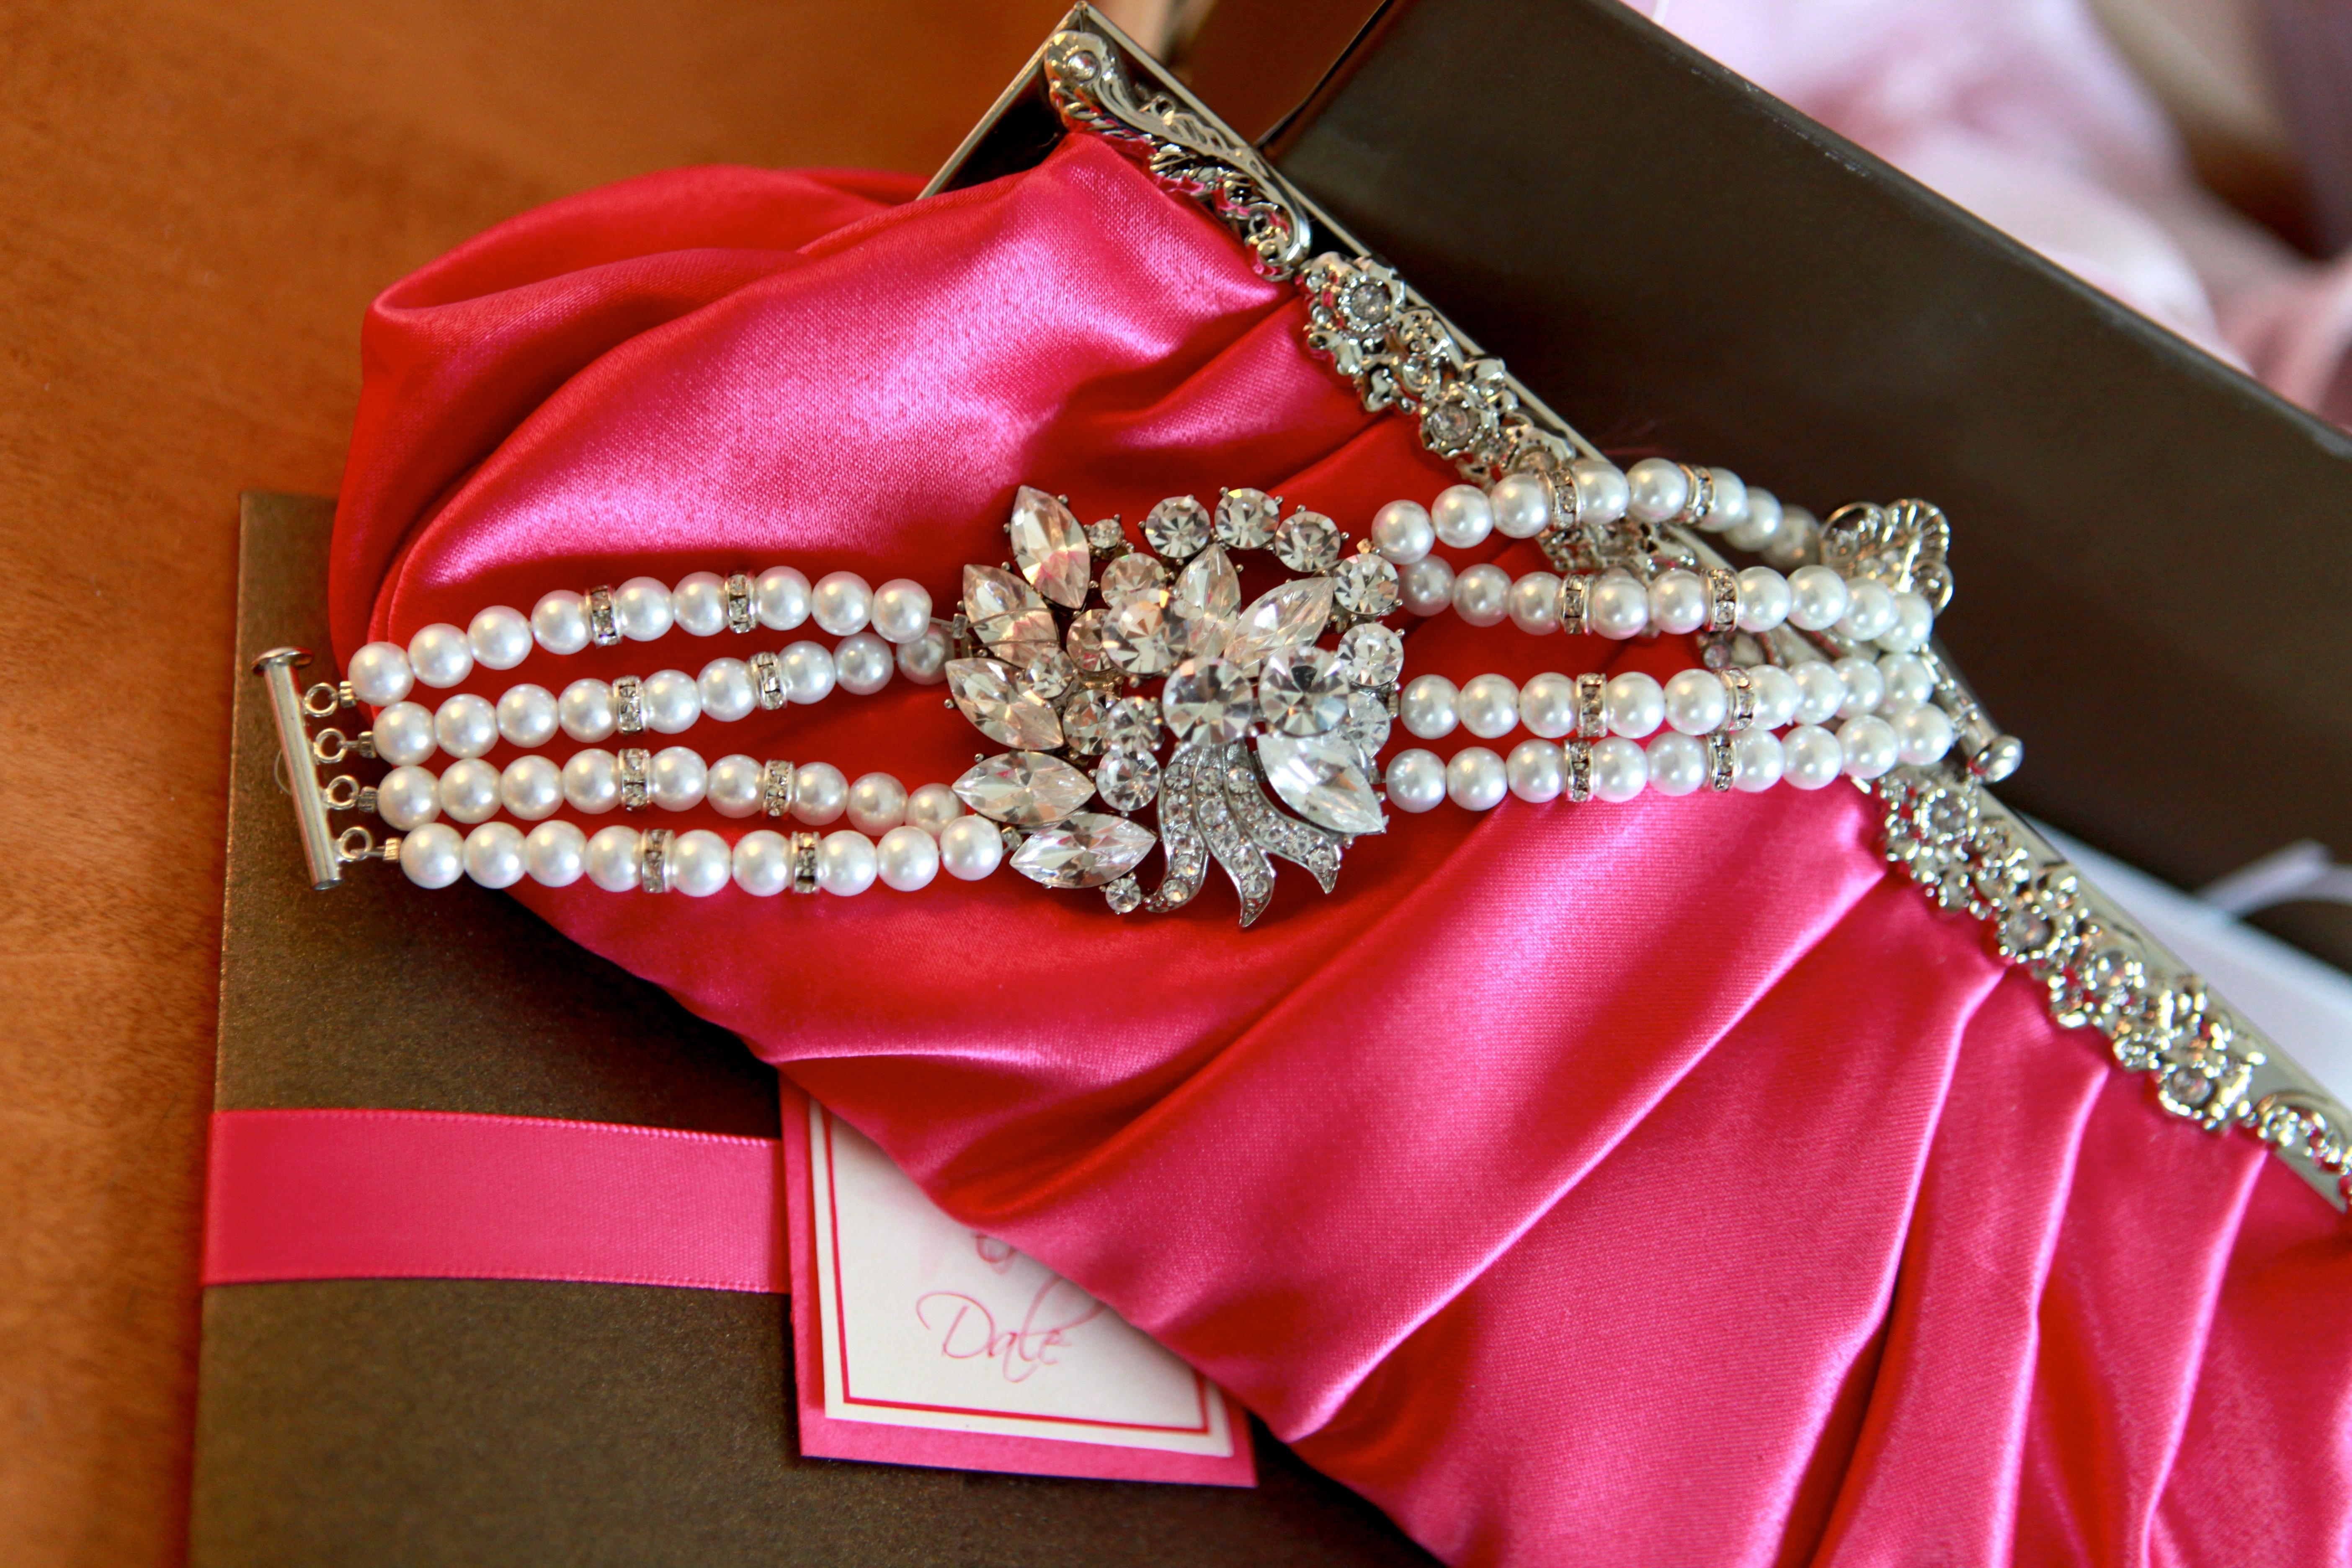 Inspiration, Jewelry, Stationery, pink, invitation, Invitations, Board